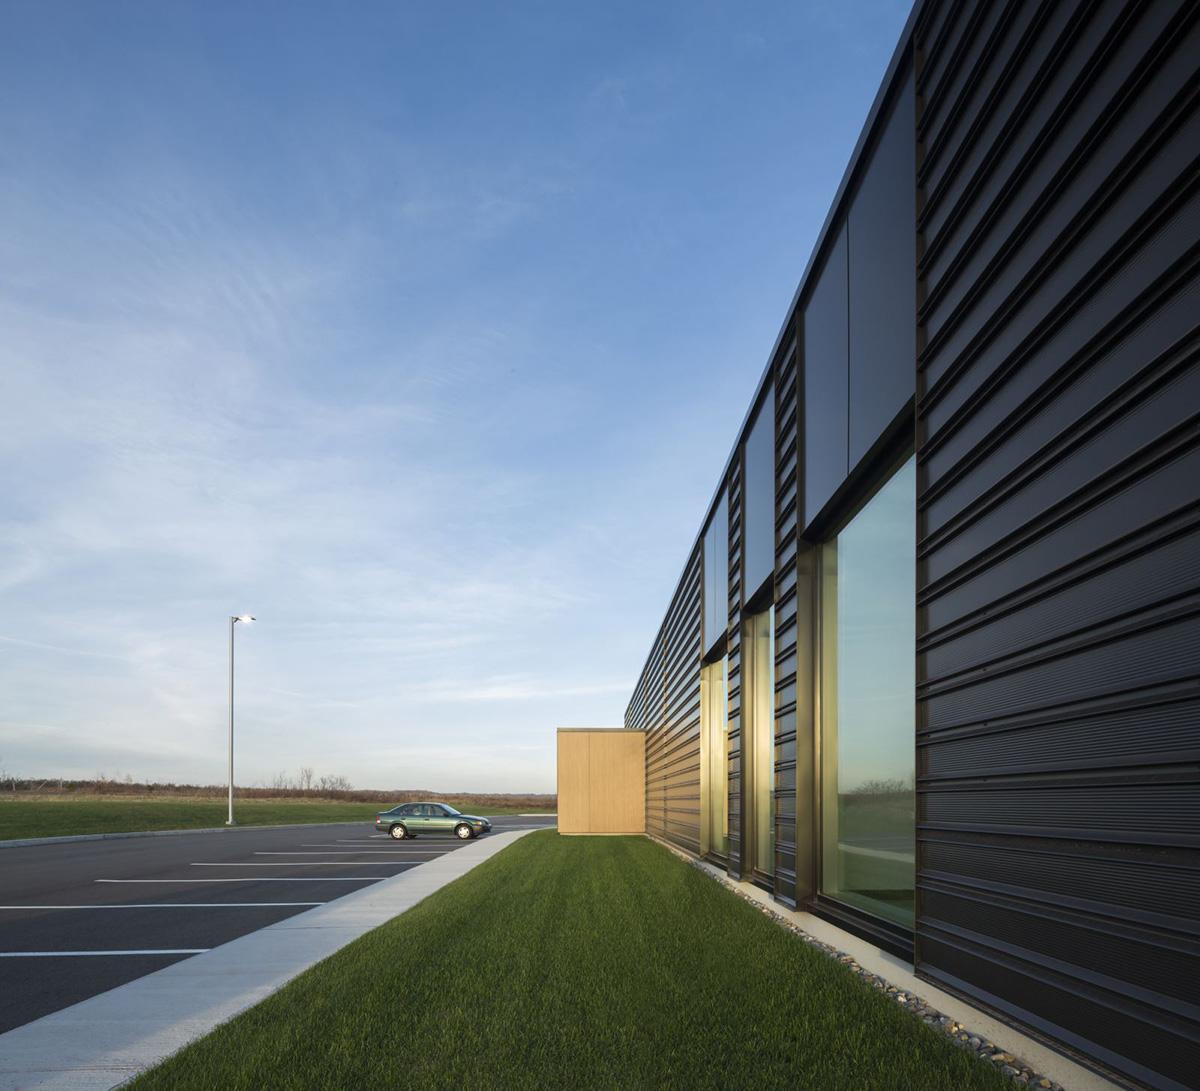 05-caserne-no5-stgm-architects-ccm2-architects-foto-stephane-groleau